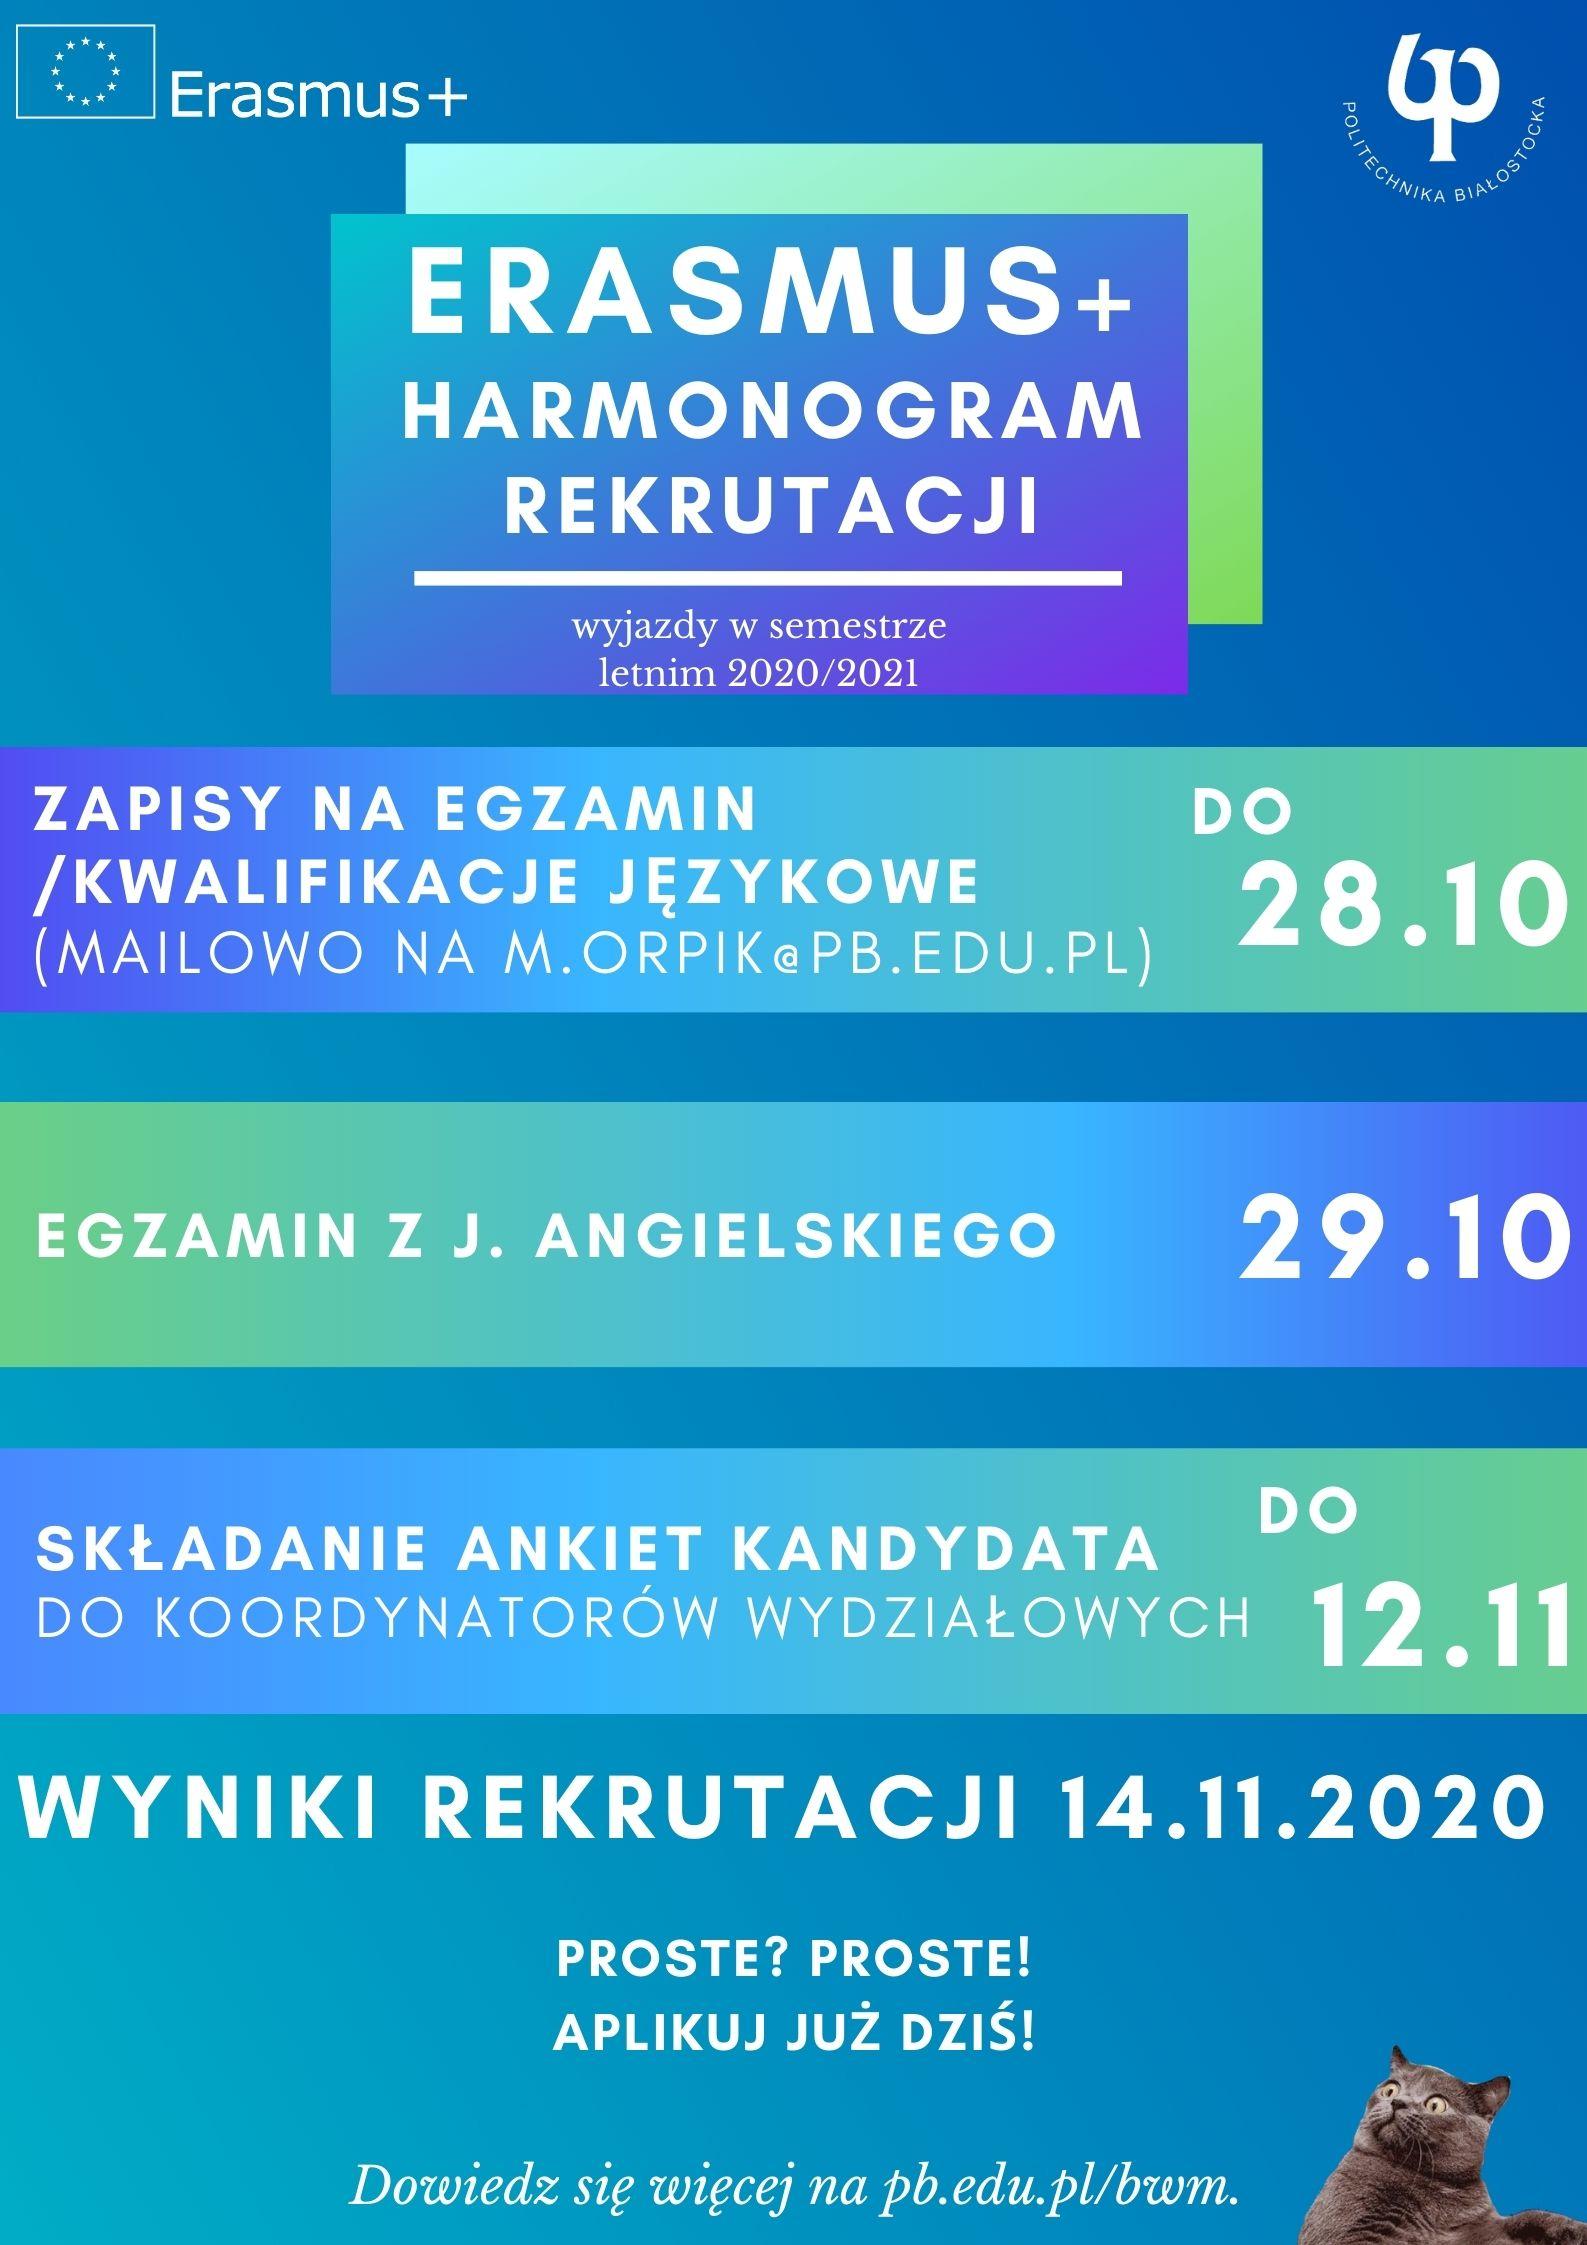 Harmonogram rekrutacji na studia Erasmus+ w sem. letnim 2020/21